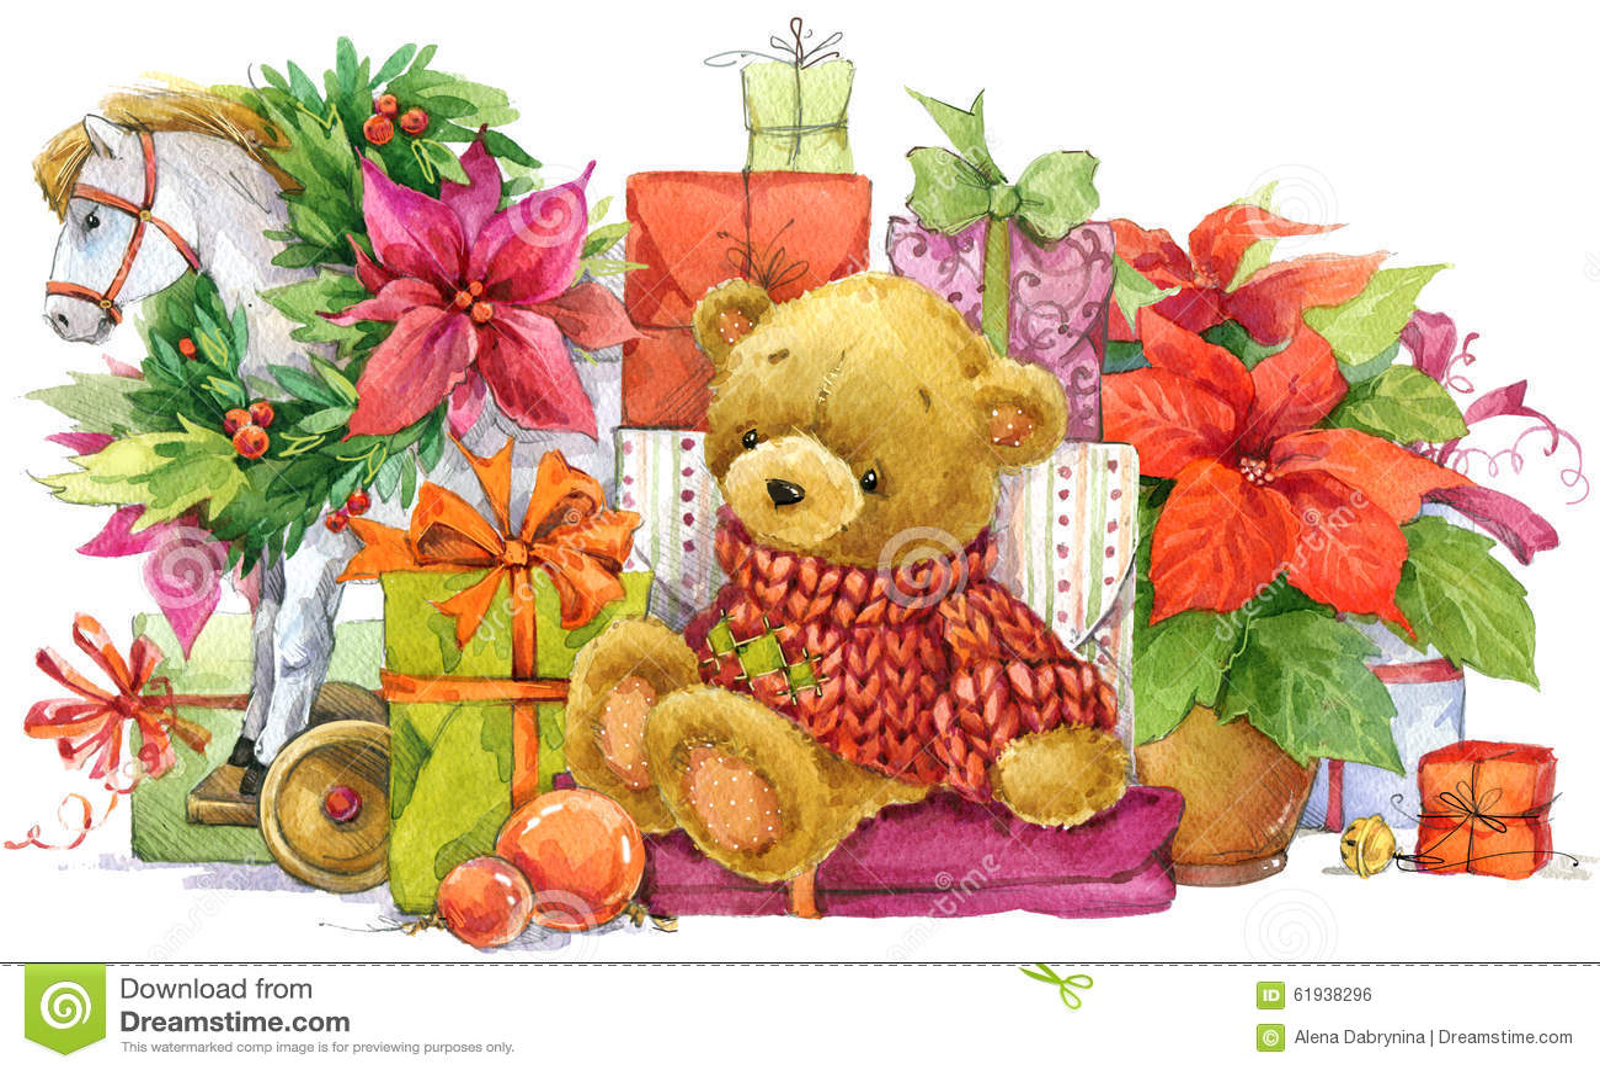 Teddy Bear And Christmas Gifts New Year And Christmas